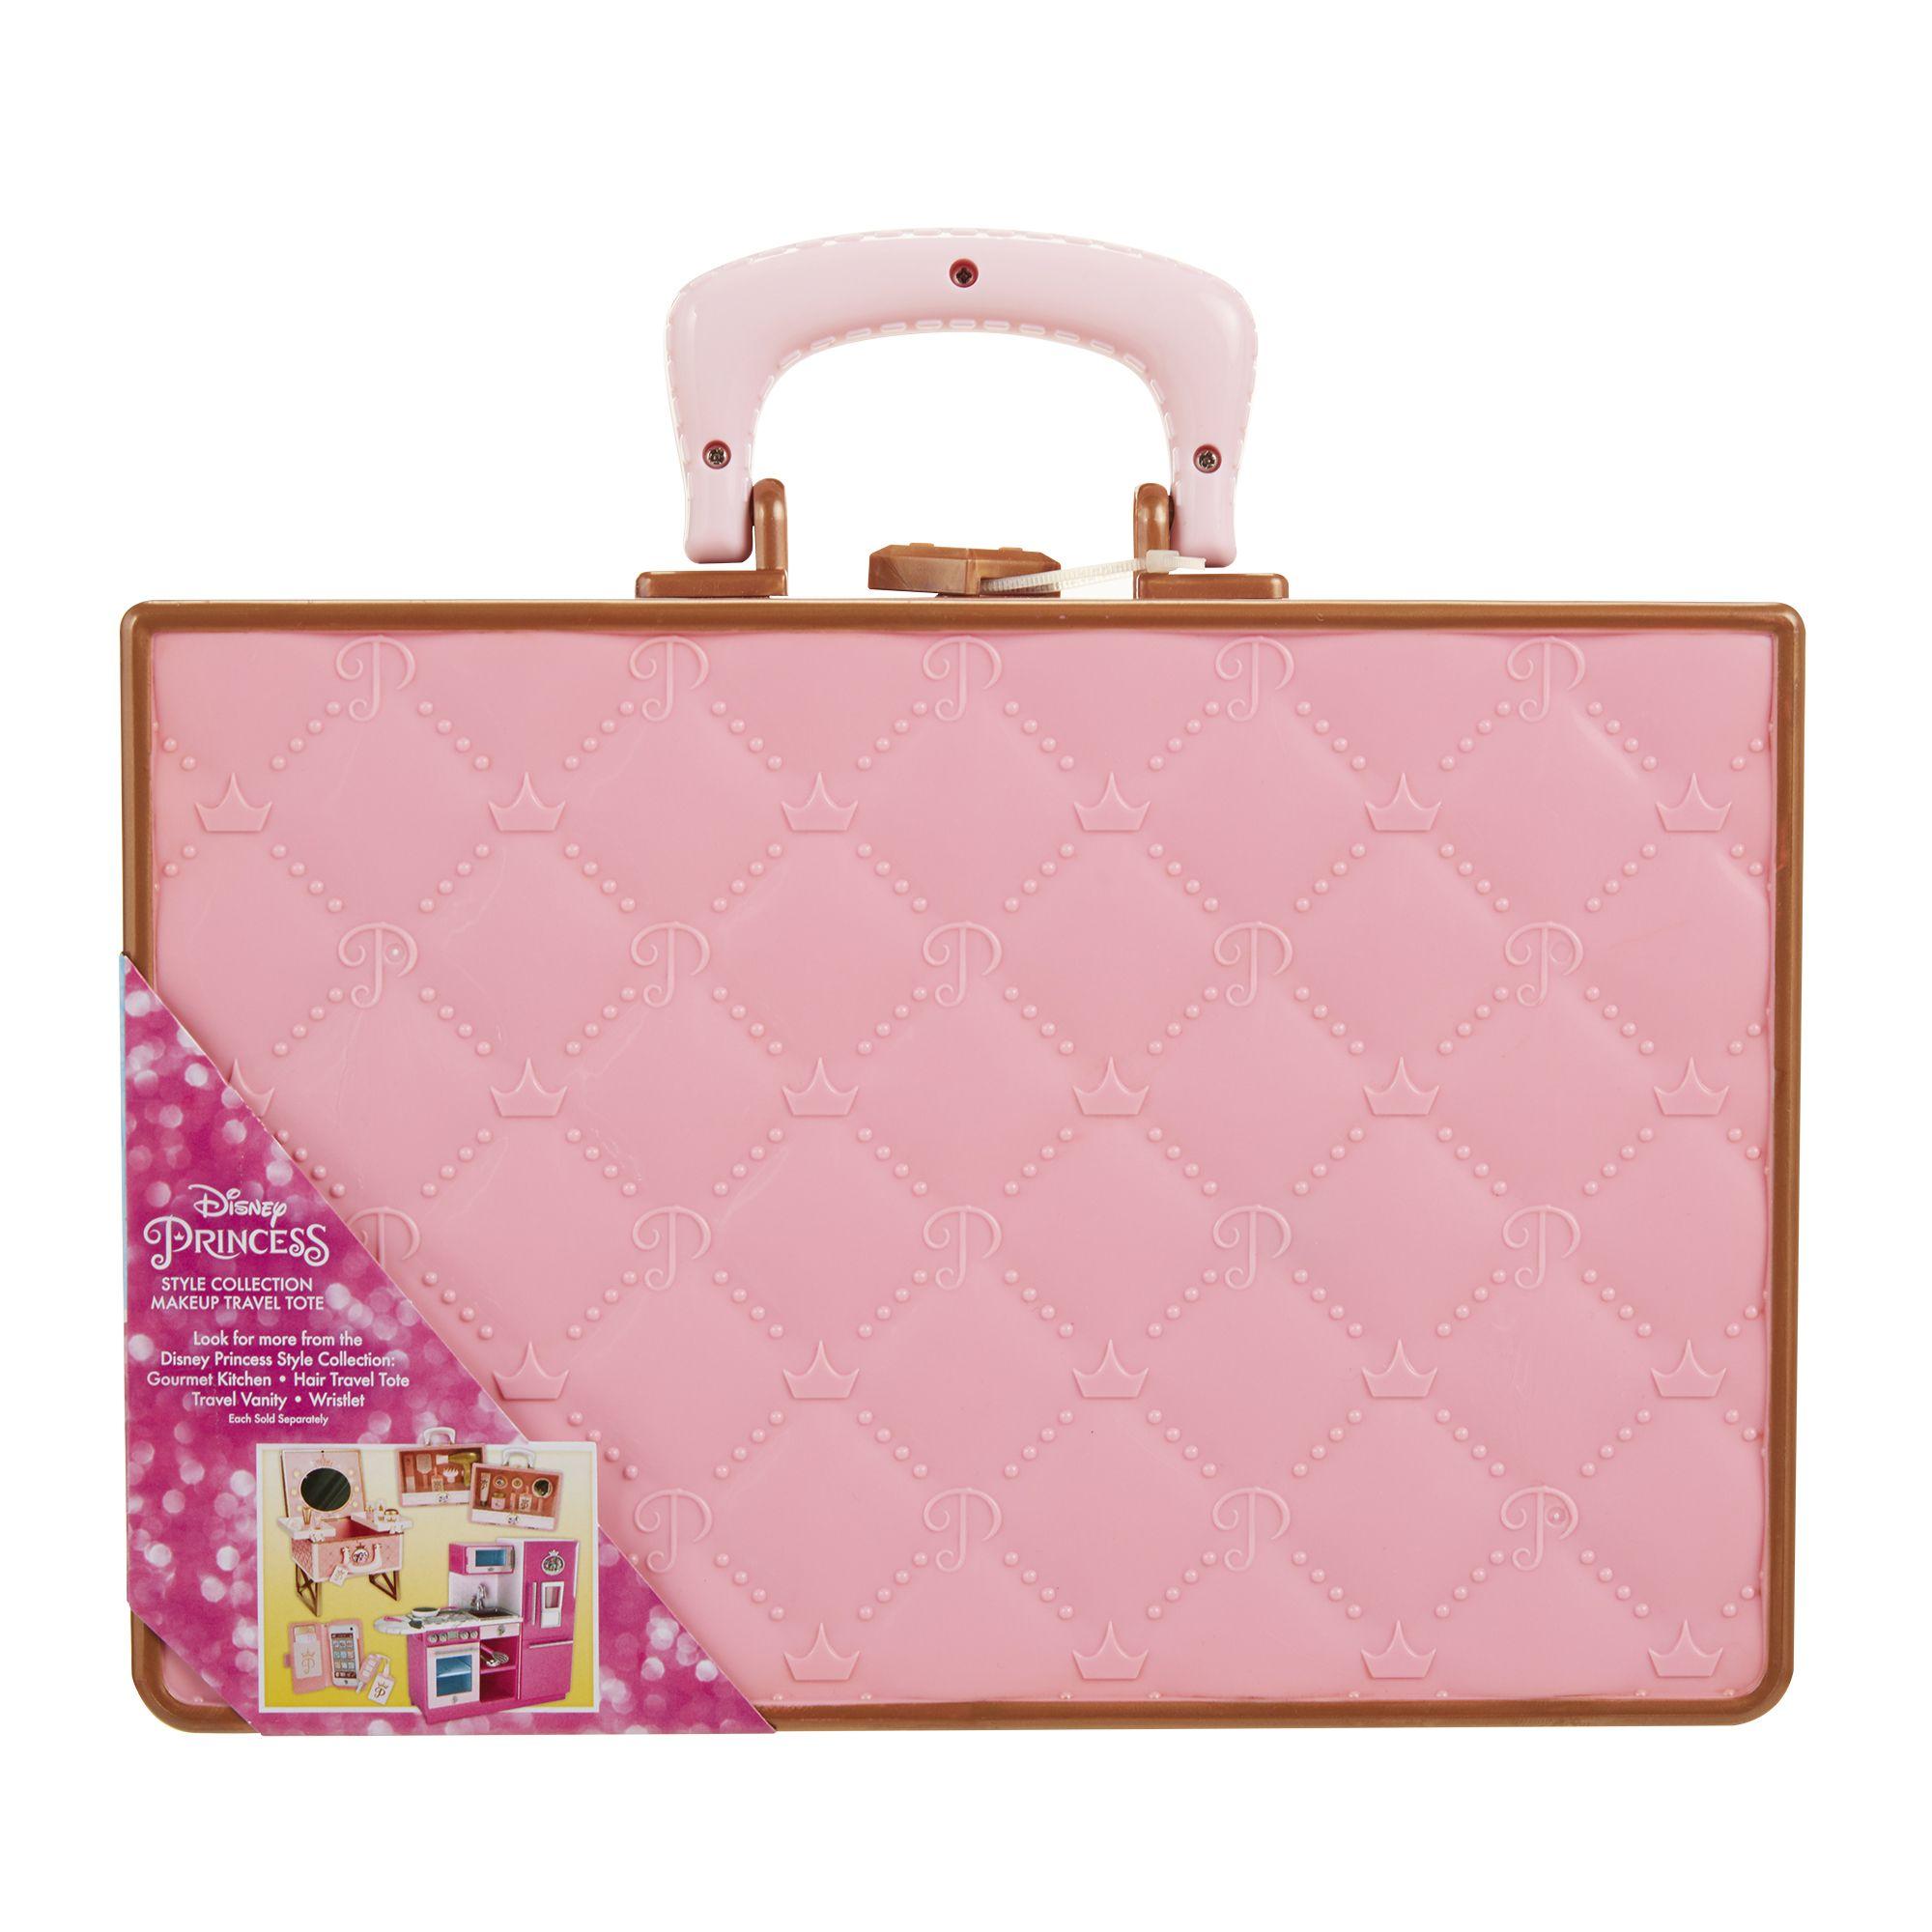 Disney princess dp makeup travel tote pink pinterest walmart